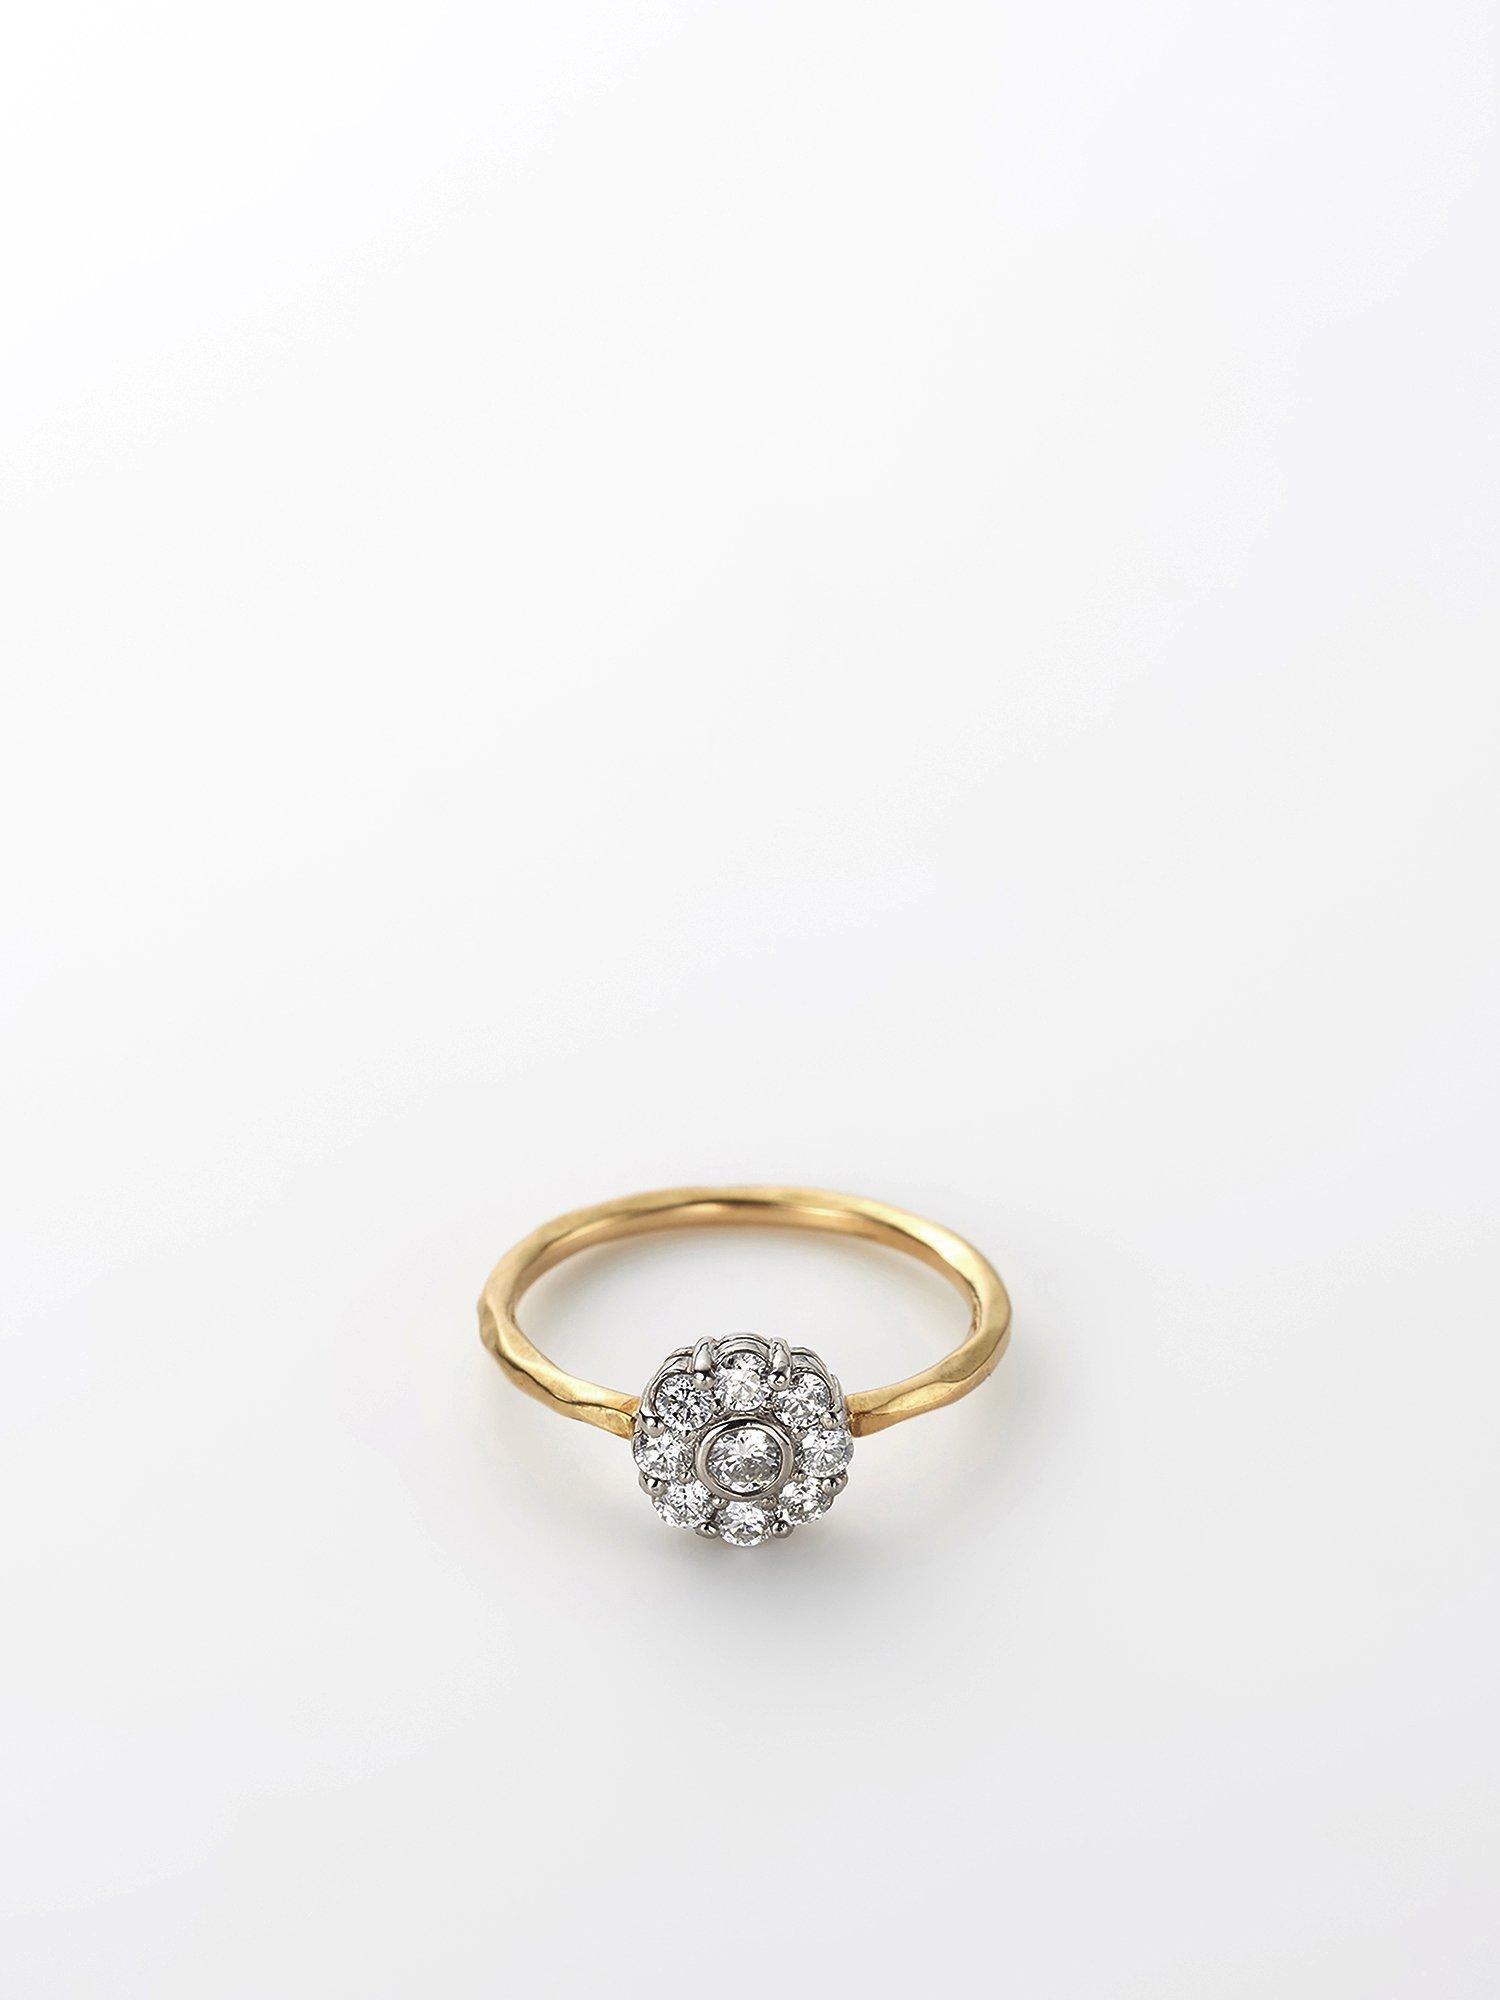 HISPANIA / Arabesque Flower ring / Diamond